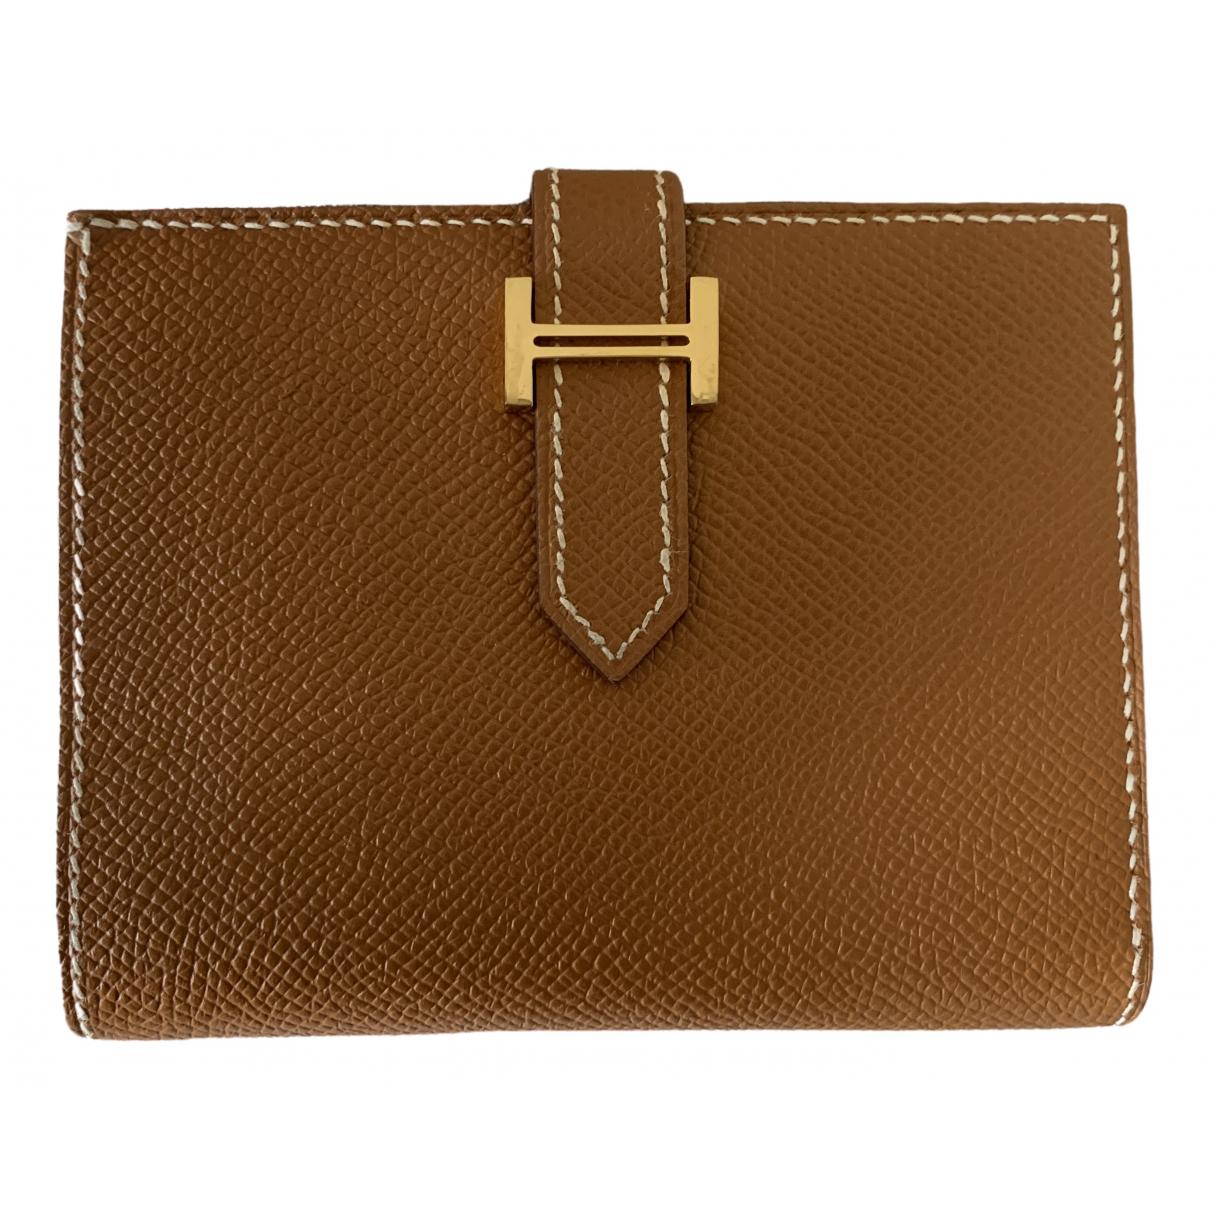 Hermès Béarn Camel Leather wallet for Women \N